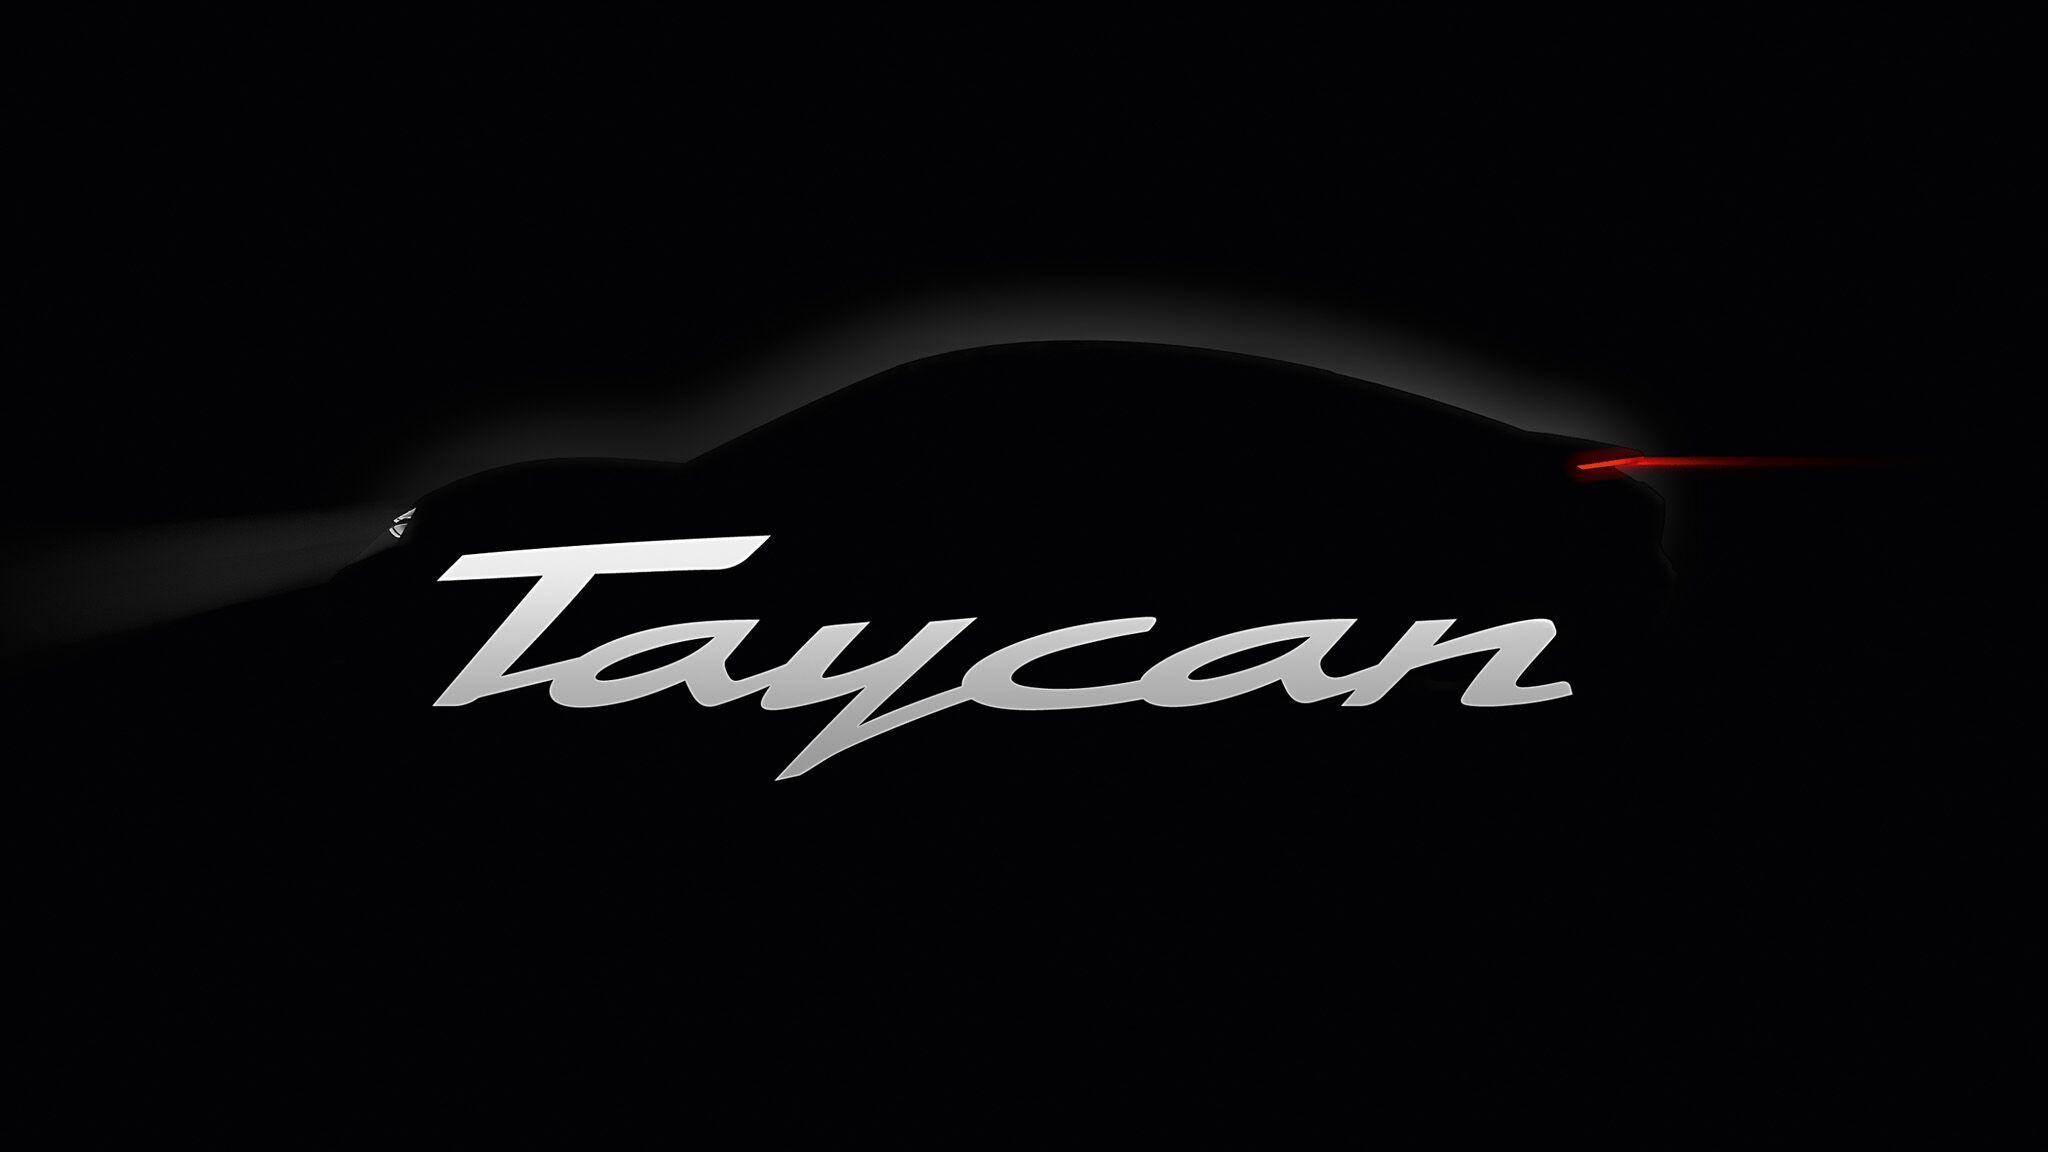 Porsche Taycan interest in Colorado Springs, CO